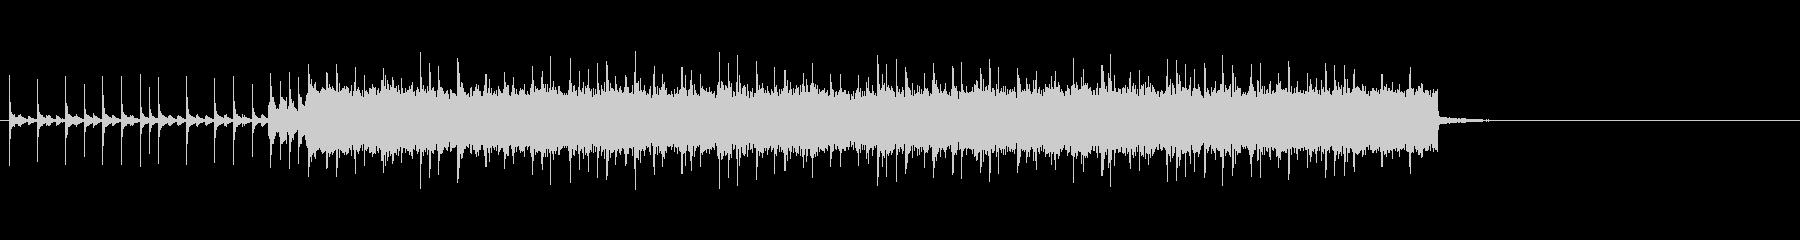 PUNK/ROCKのジングルOPなどにの未再生の波形